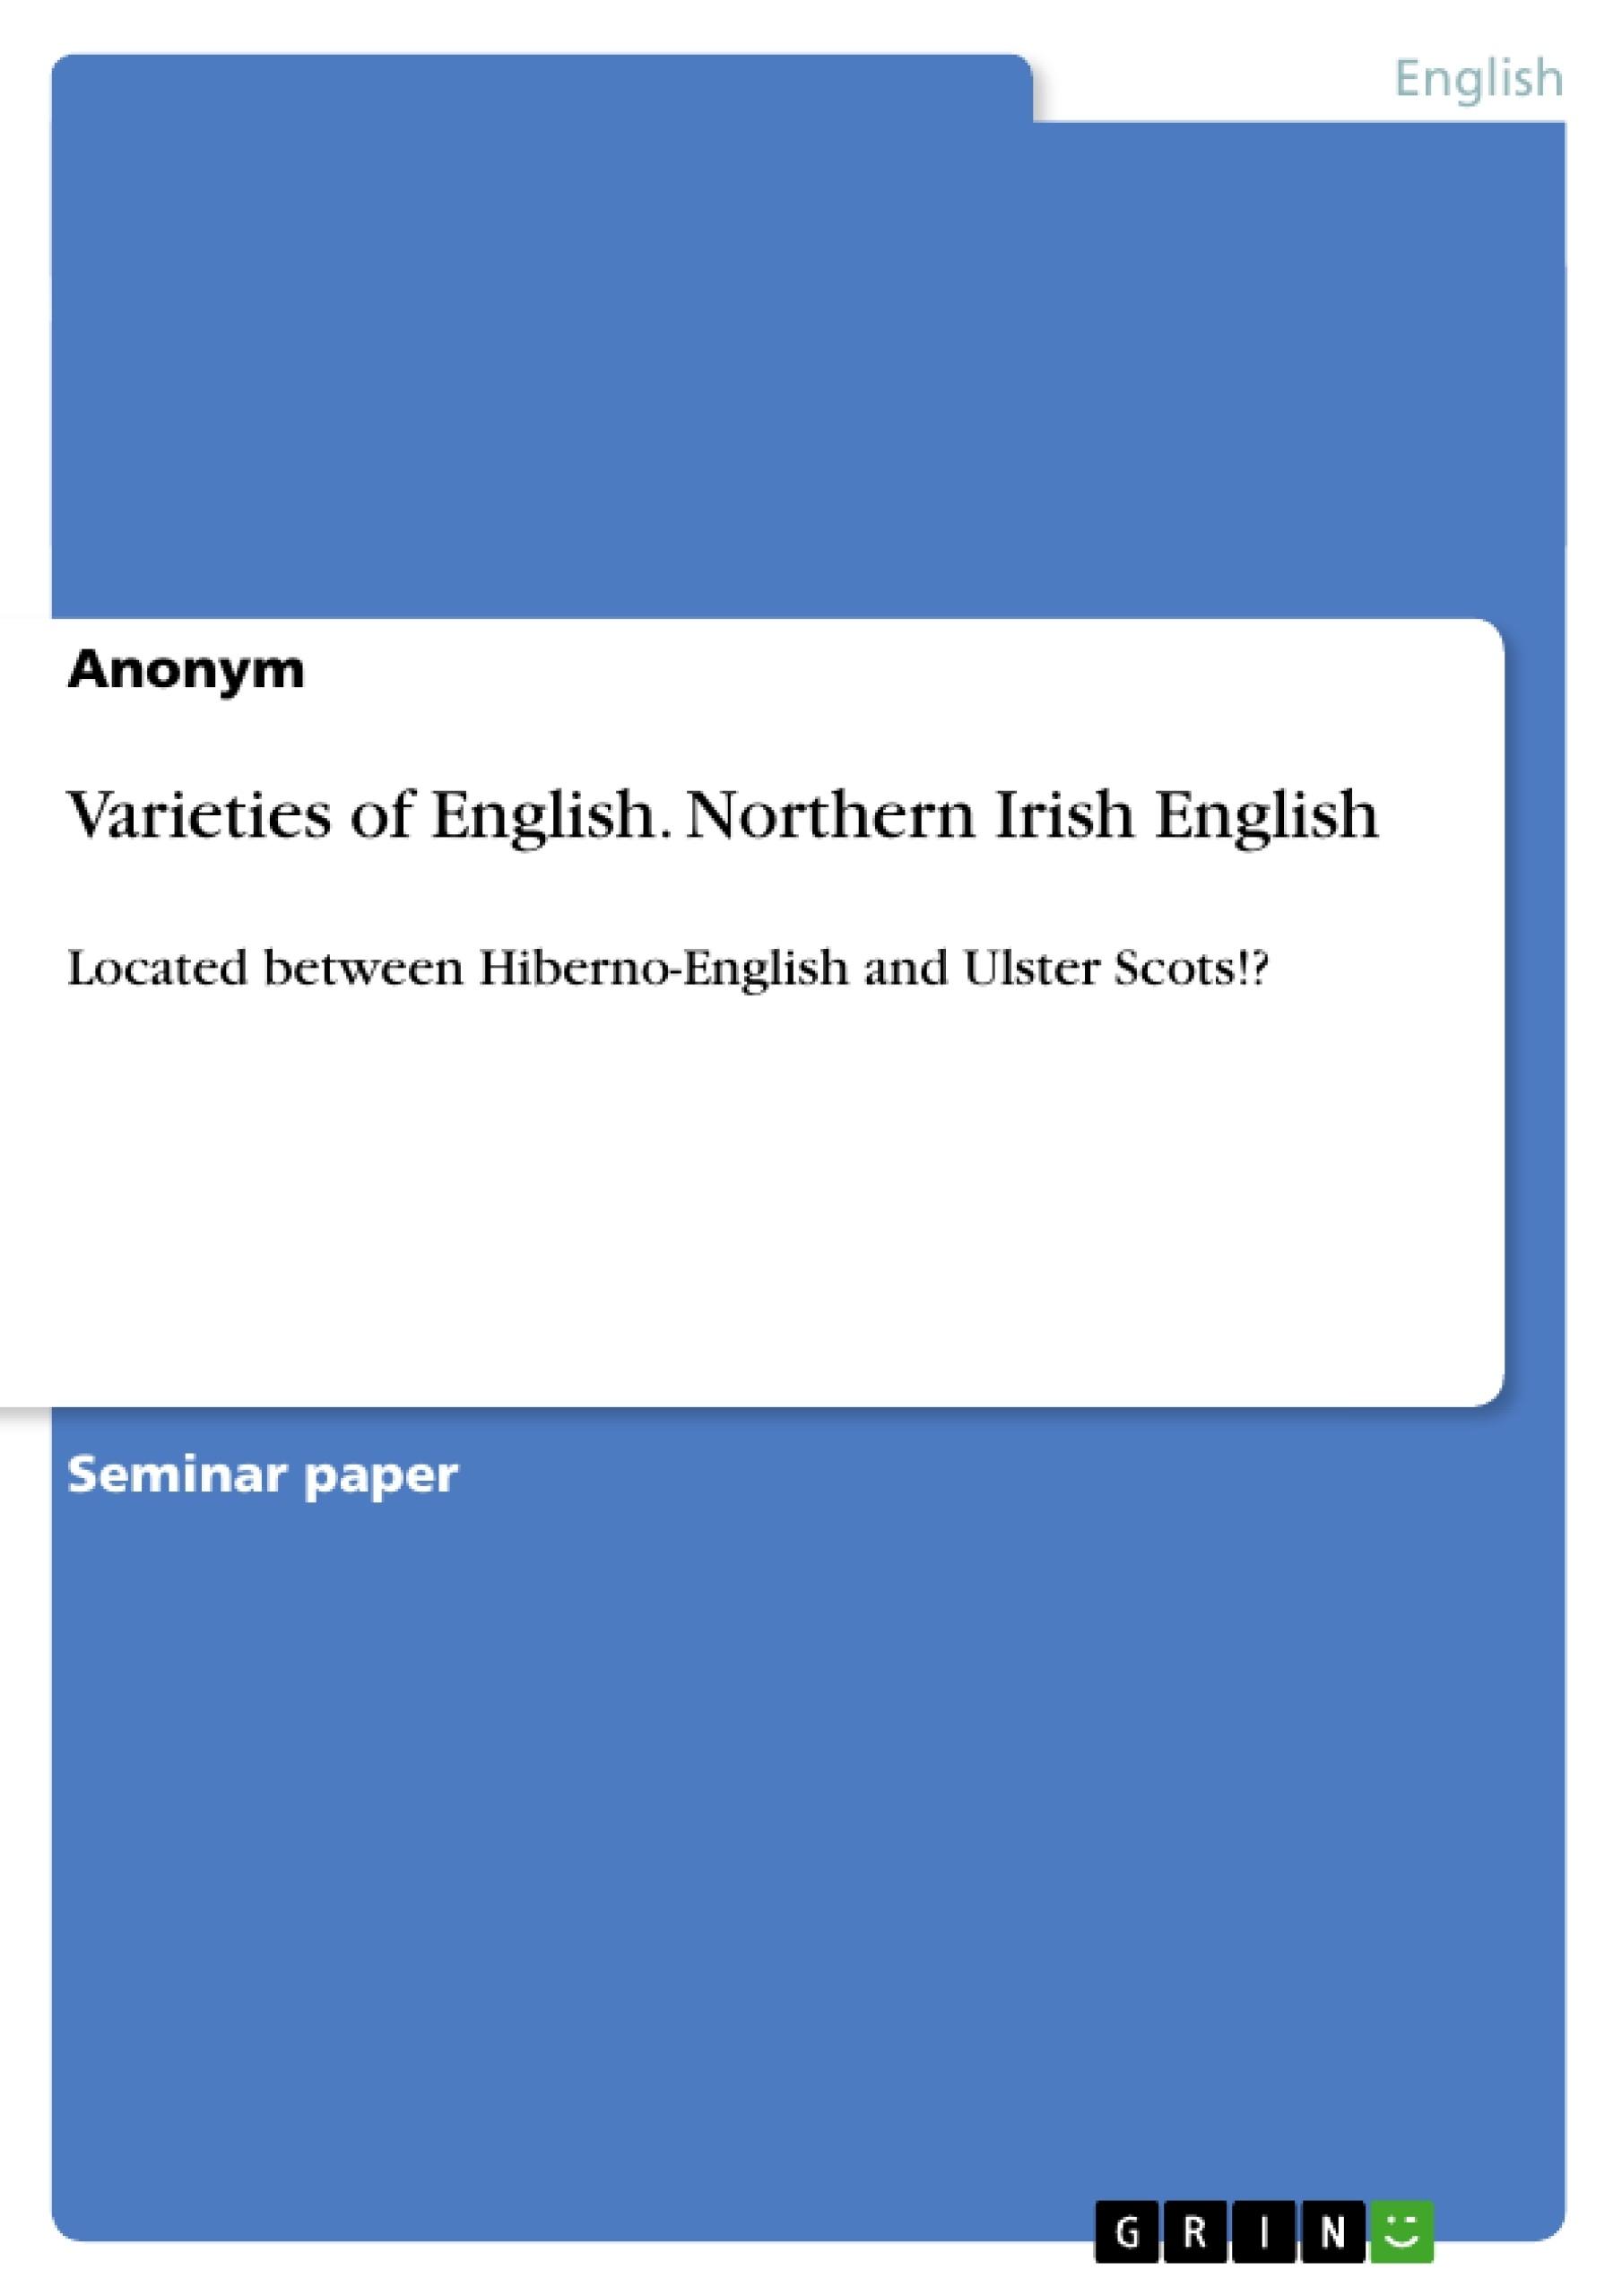 Title: Varieties of English. Northern Irish English